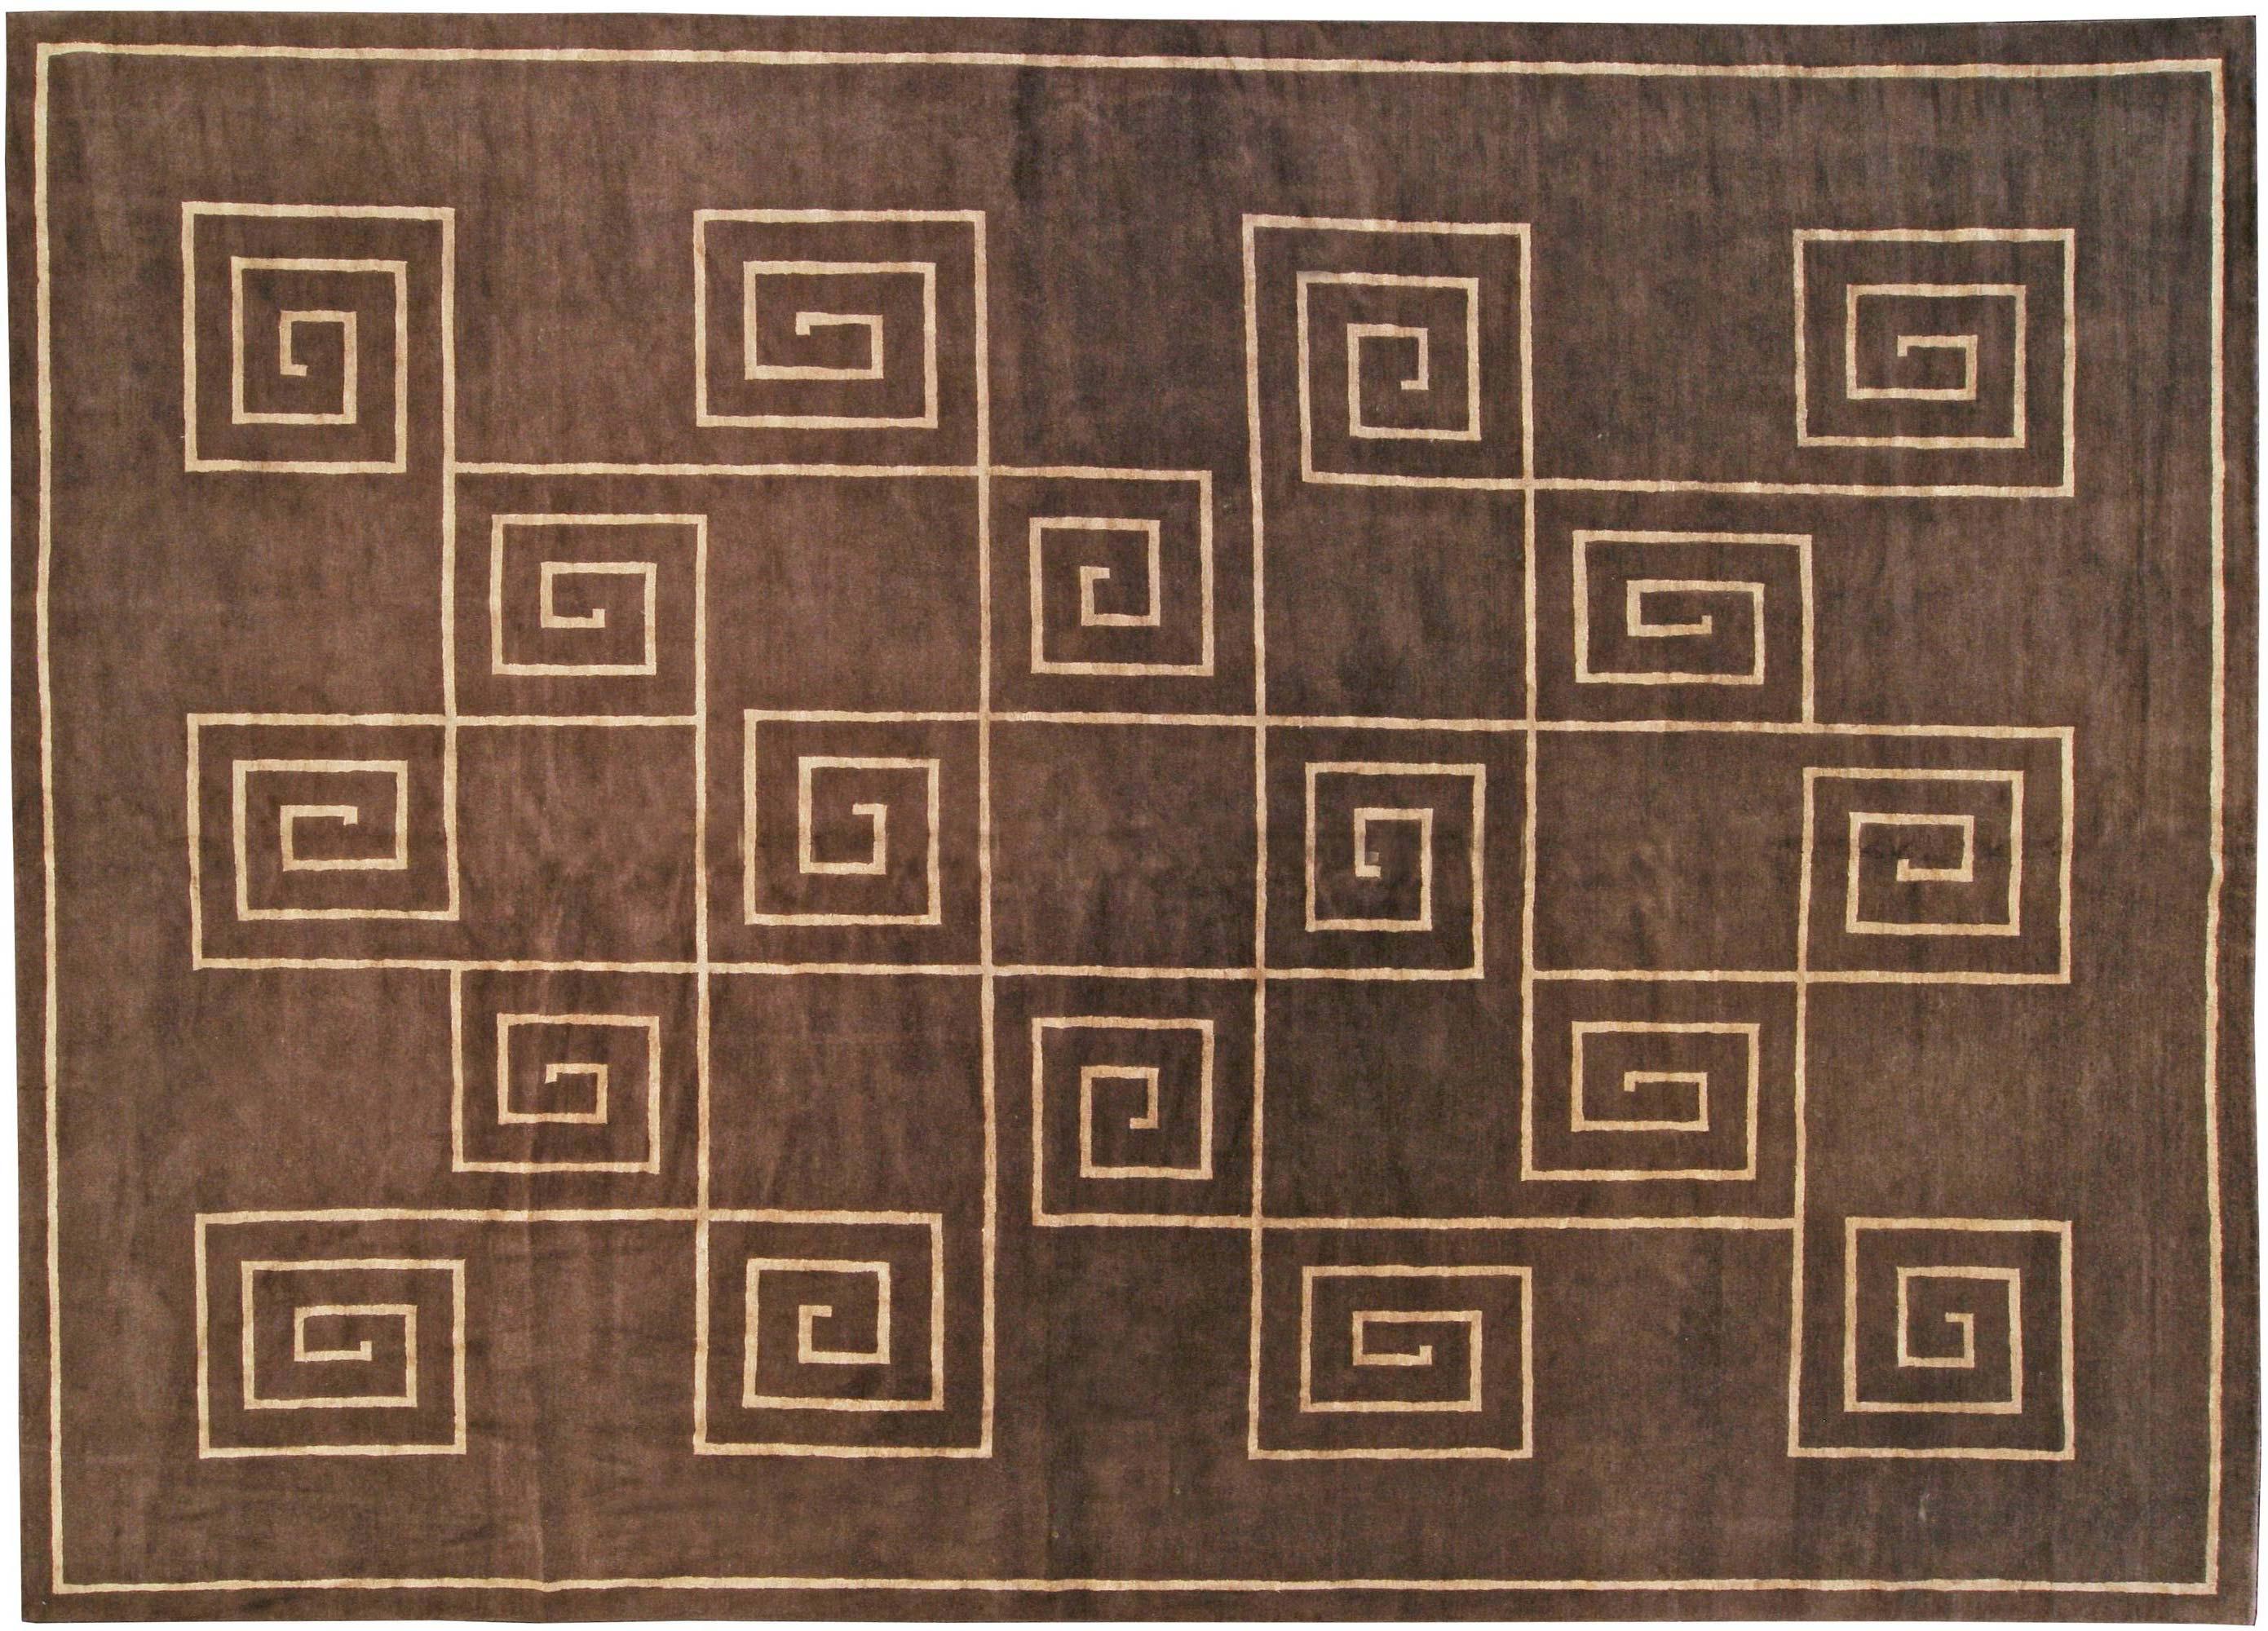 Tibetan Greek Key In Chocolate Brown And Golden Beige And Silk Rug N10957 By Dlb